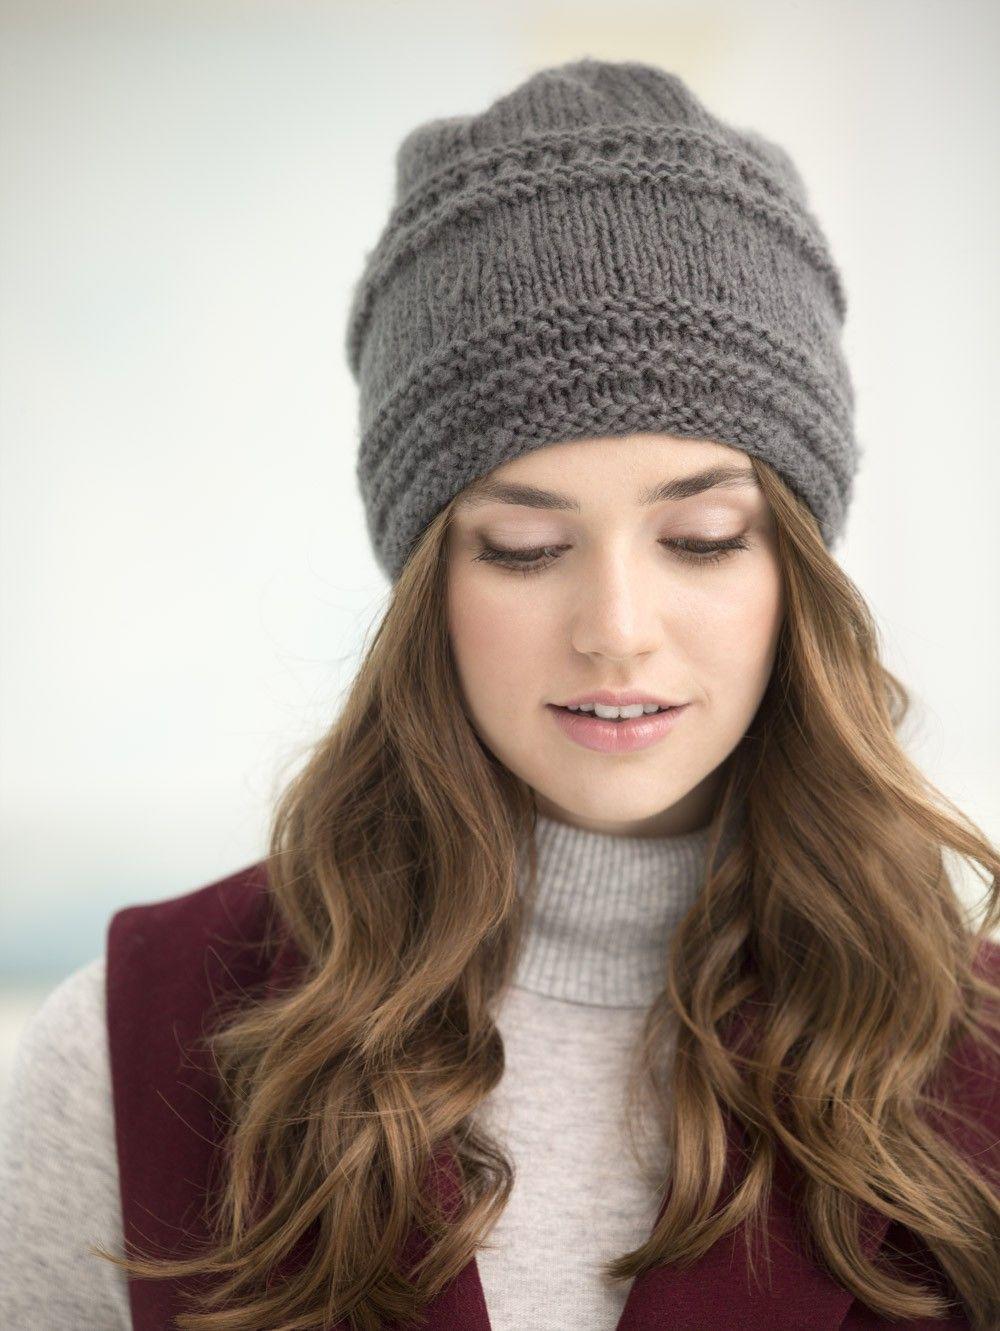 Tivoli Slouch Hat Knit Nutcracker 2015 Knitting Pinterest